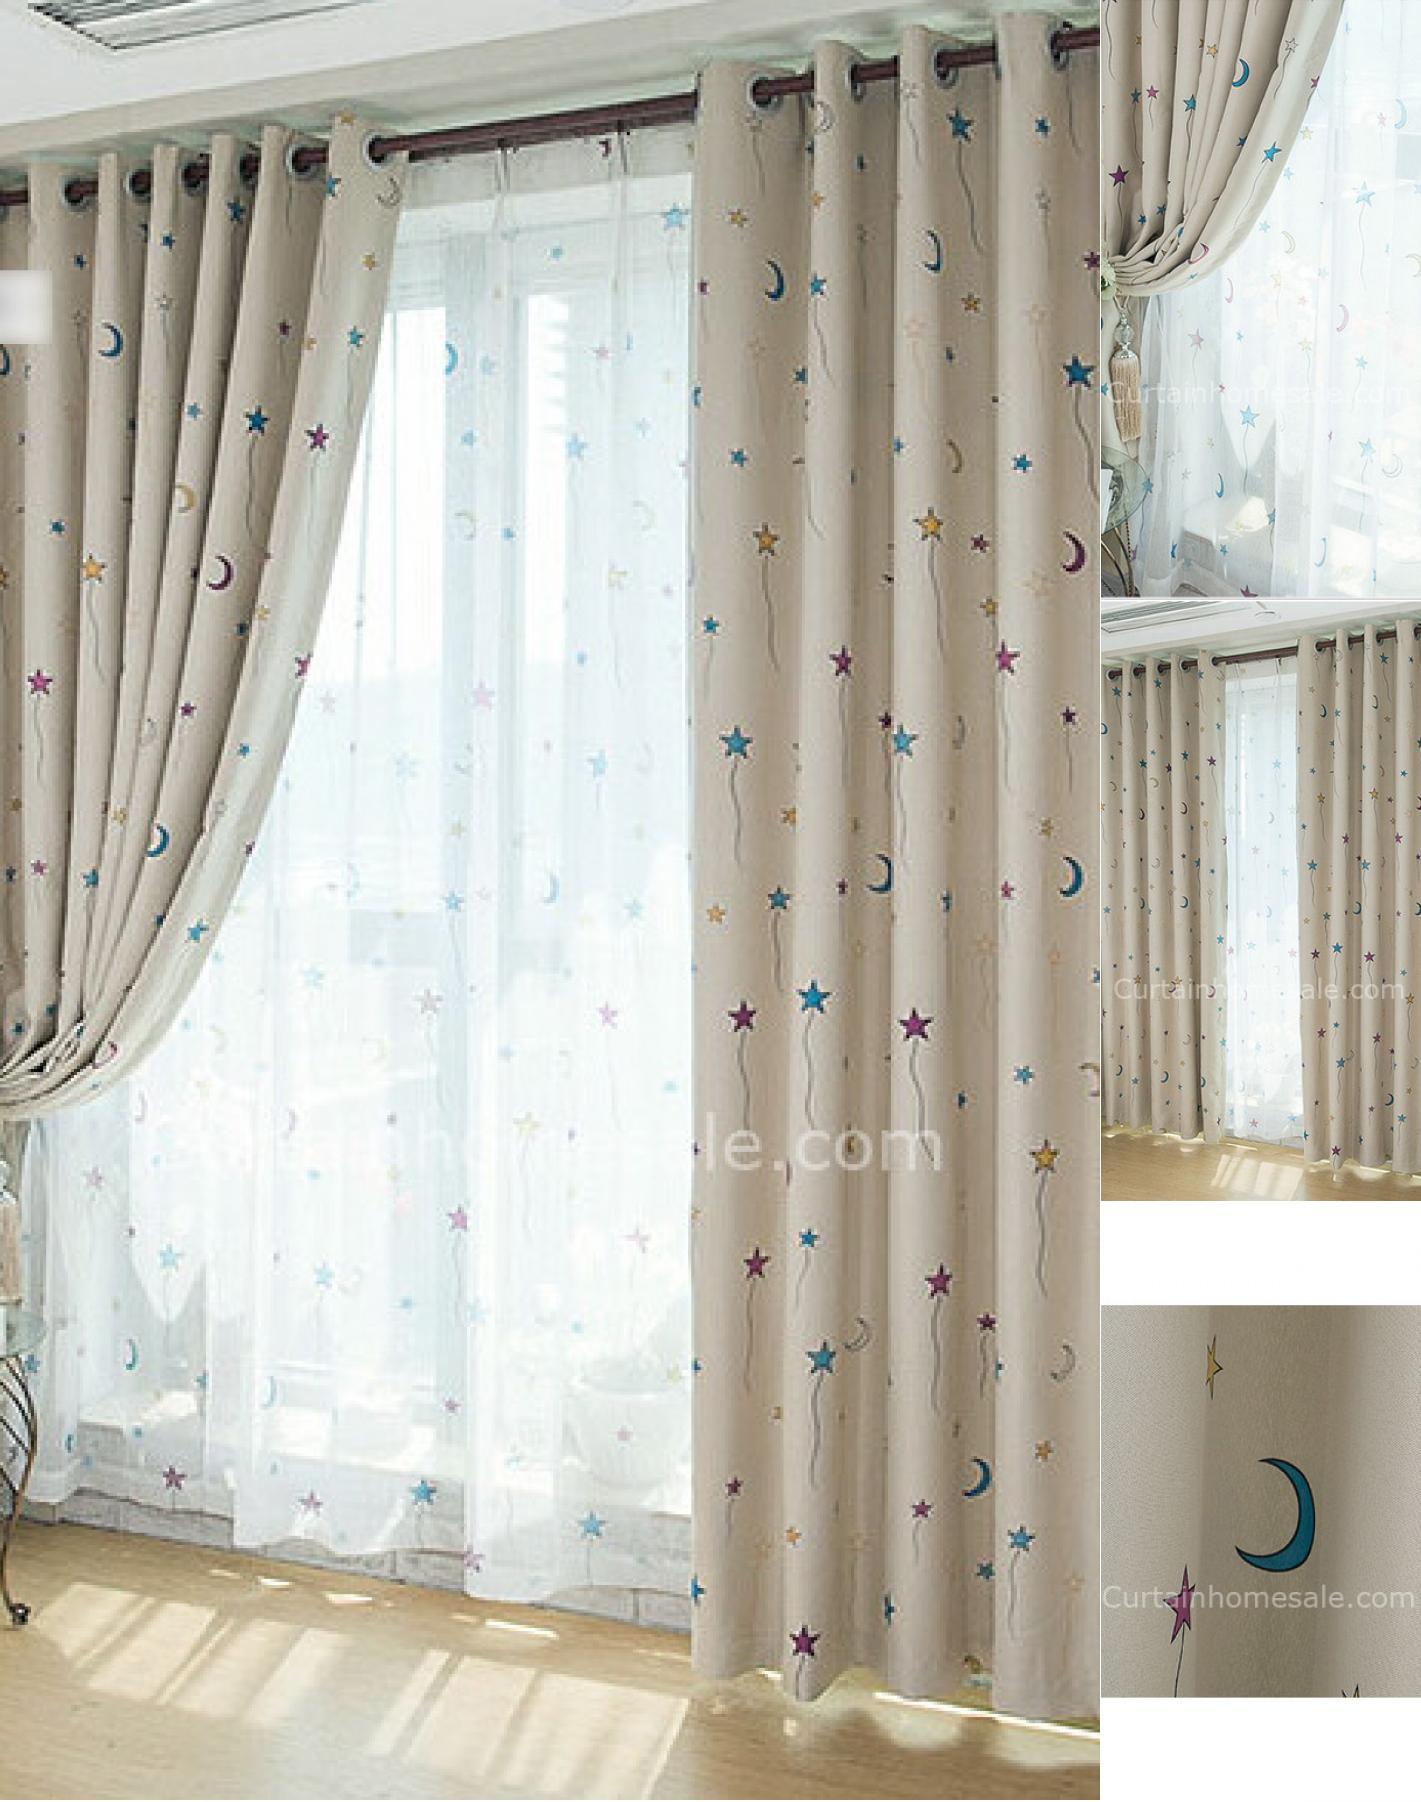 Nursery Blackout Curtains BestCurtains